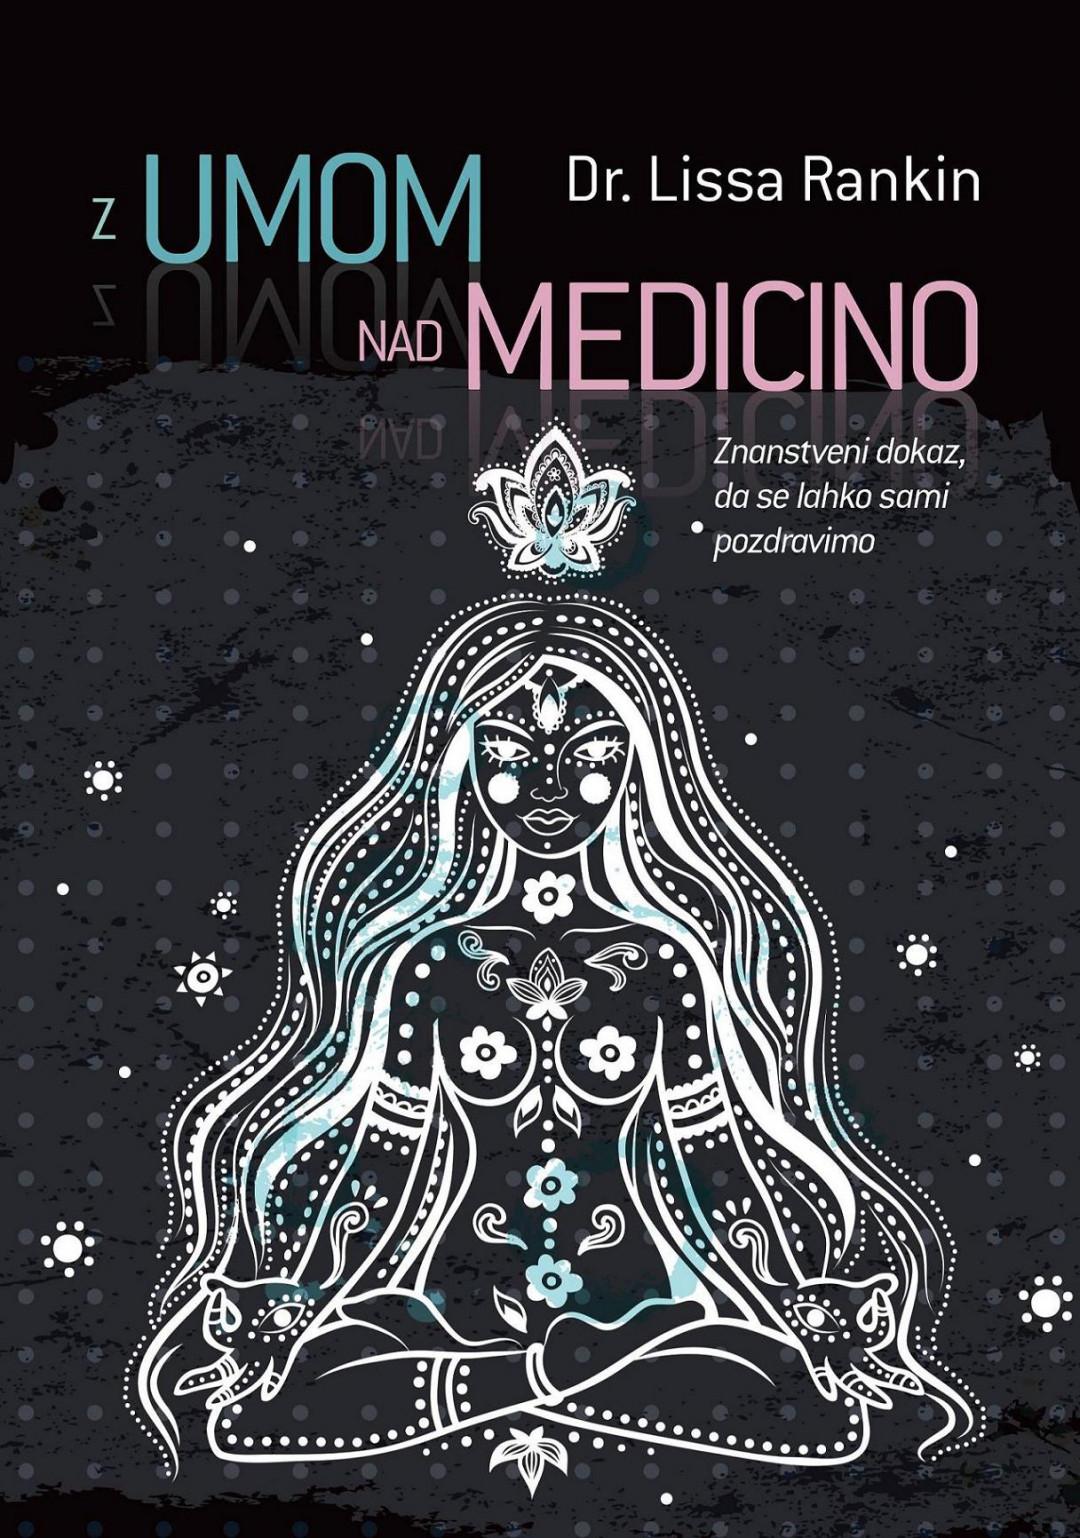 Naslovnica Um medicina